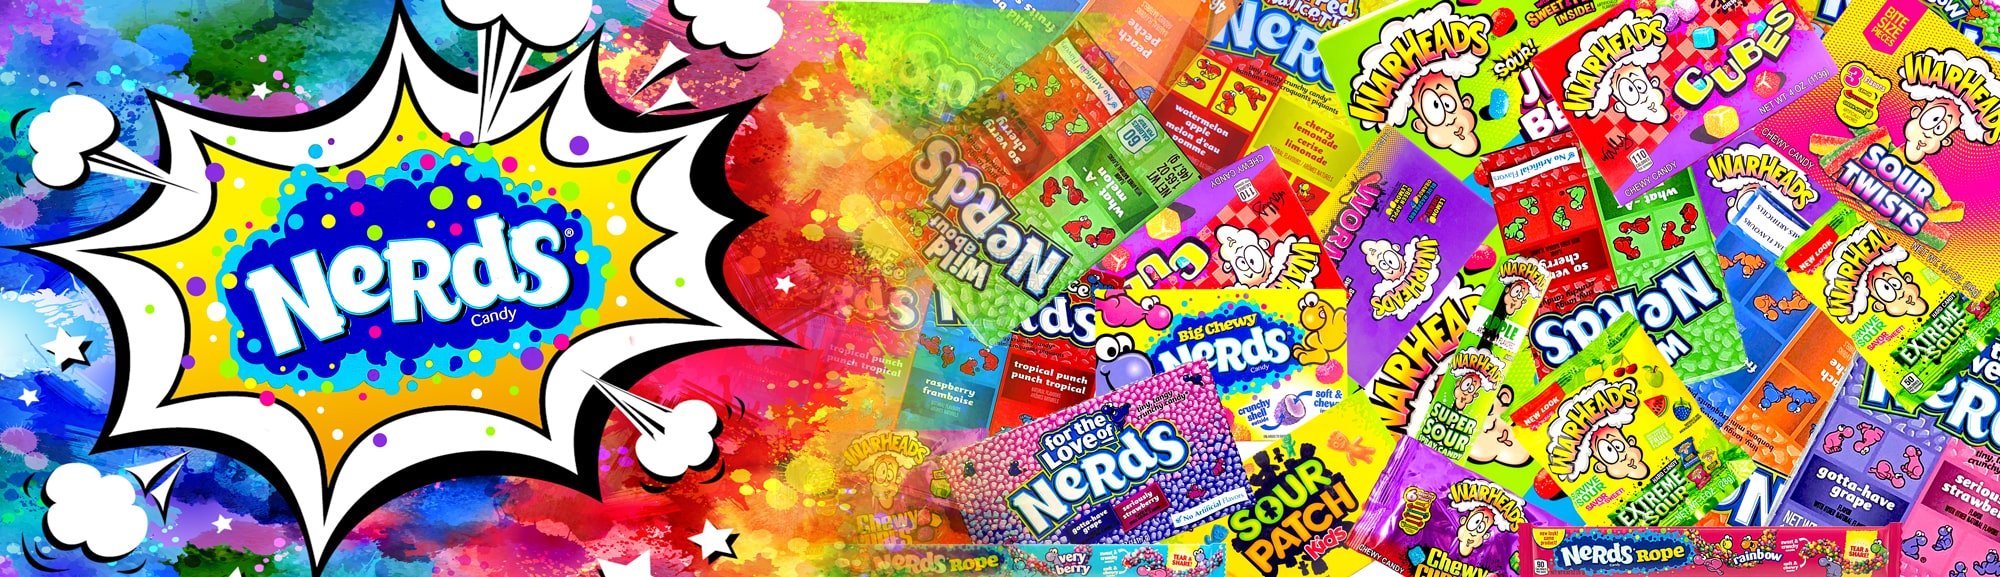 nerds konfektes saldumi